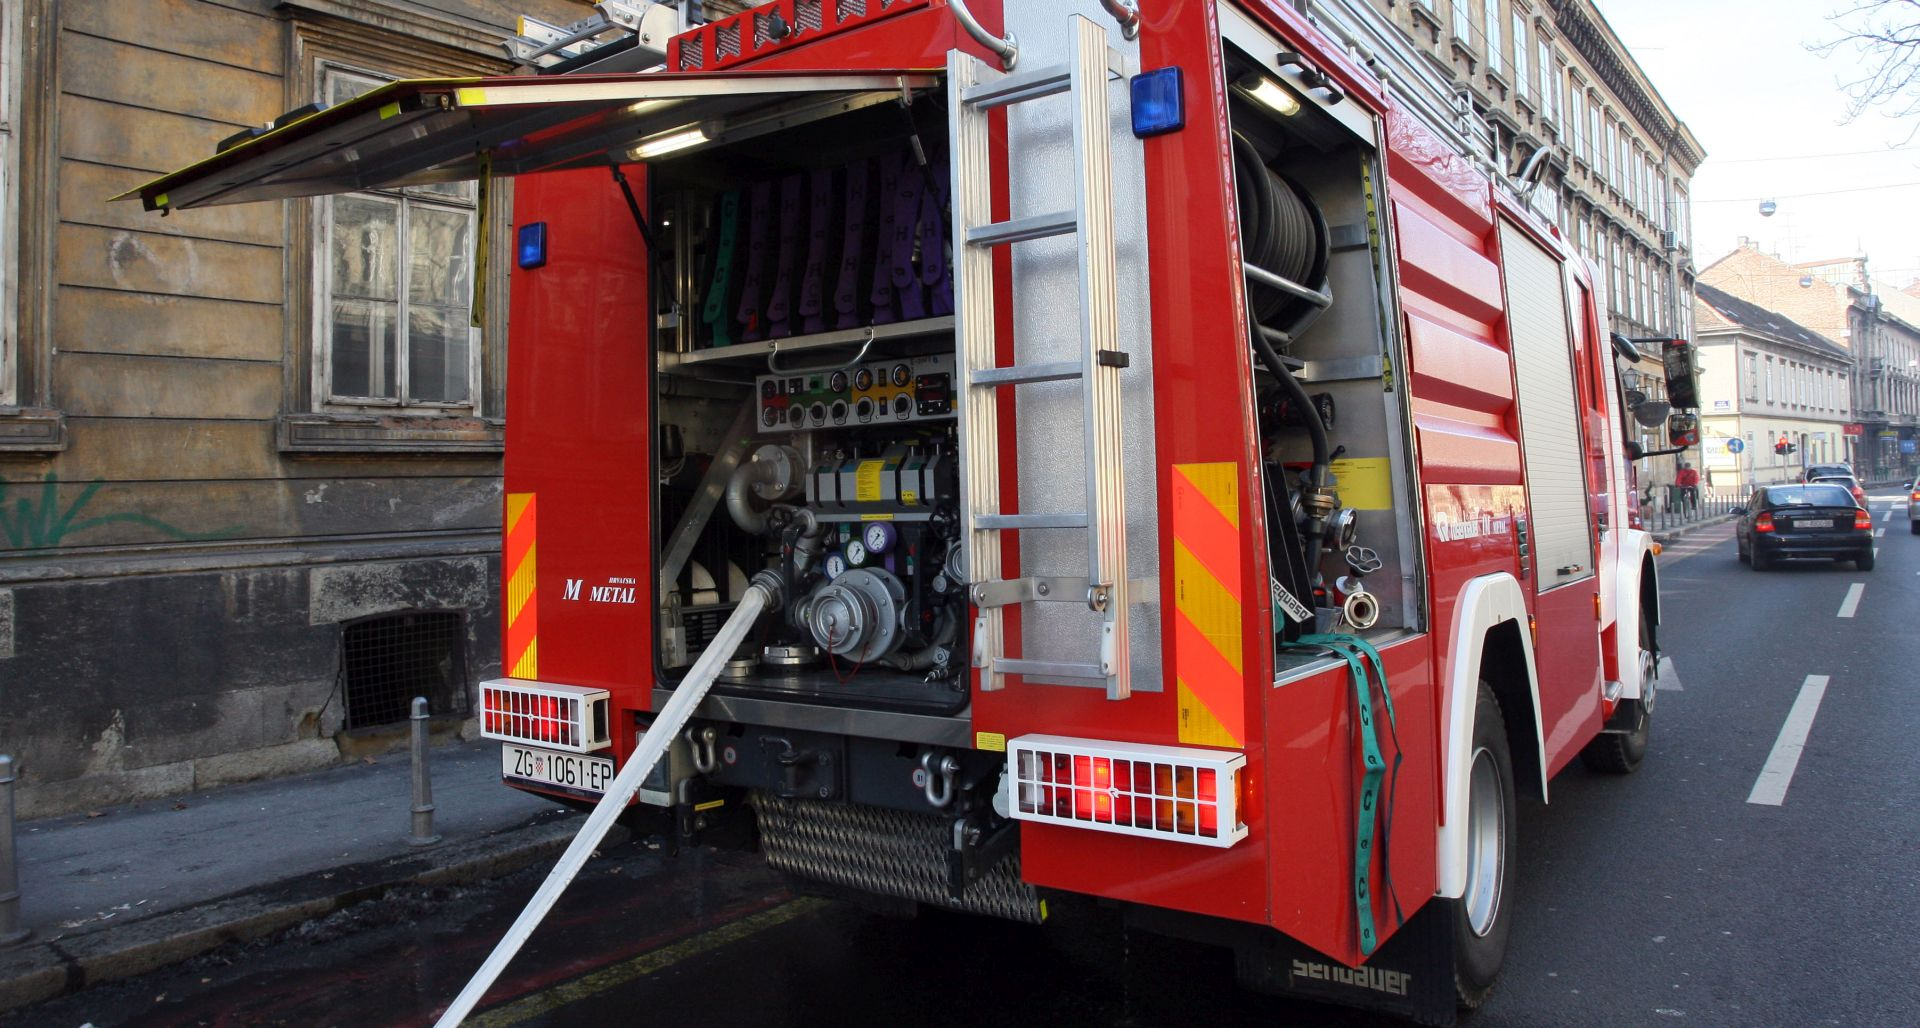 MAKARSKA Žena poginula u požaru